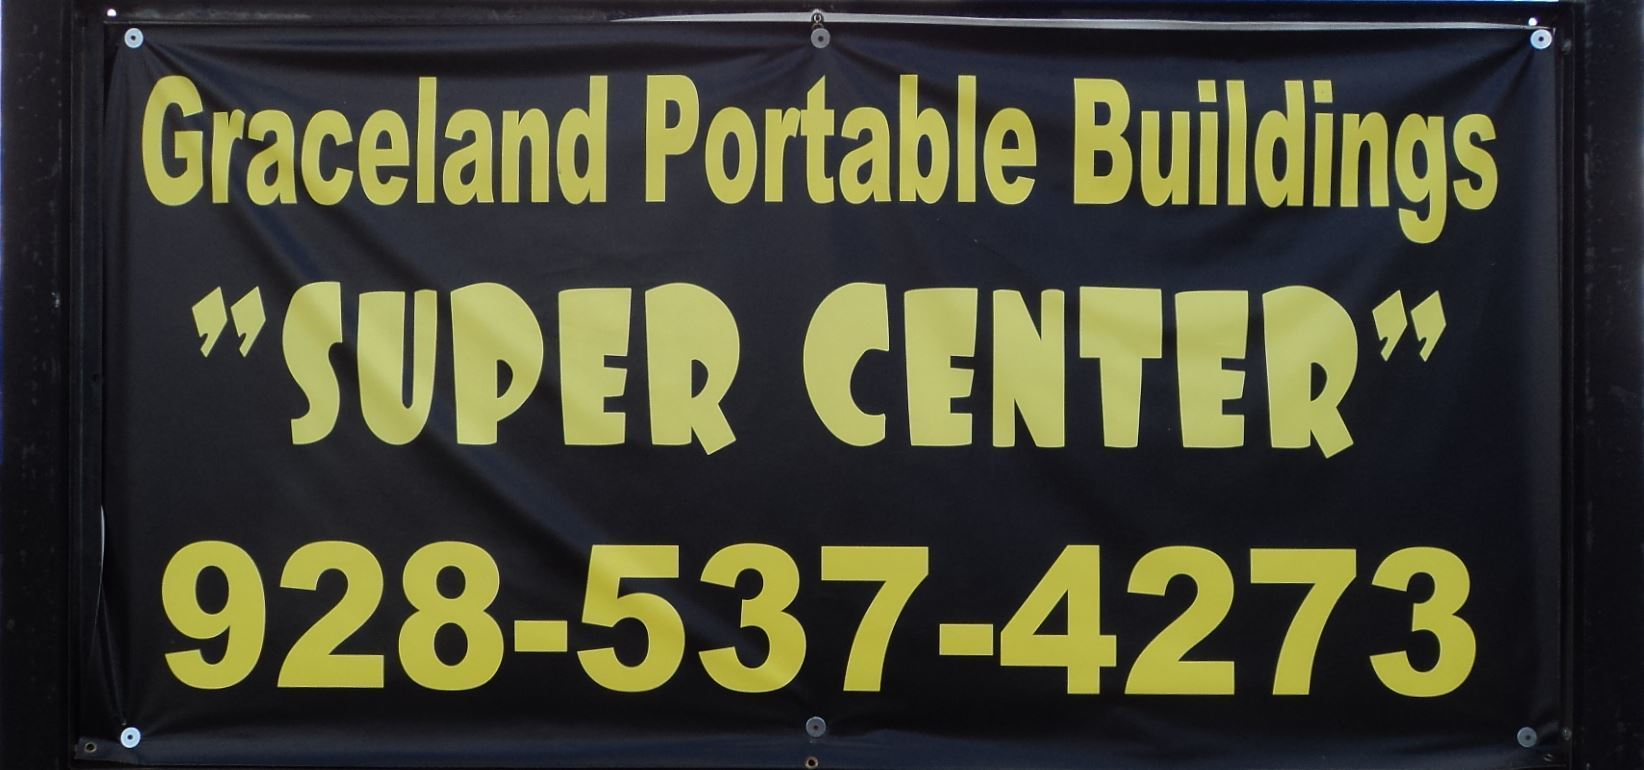 Graceland Portable Buildings Supercenter Show Low, AZ Biggest Inventory White Mountains, AZ Call for Pricing 928-537-4273